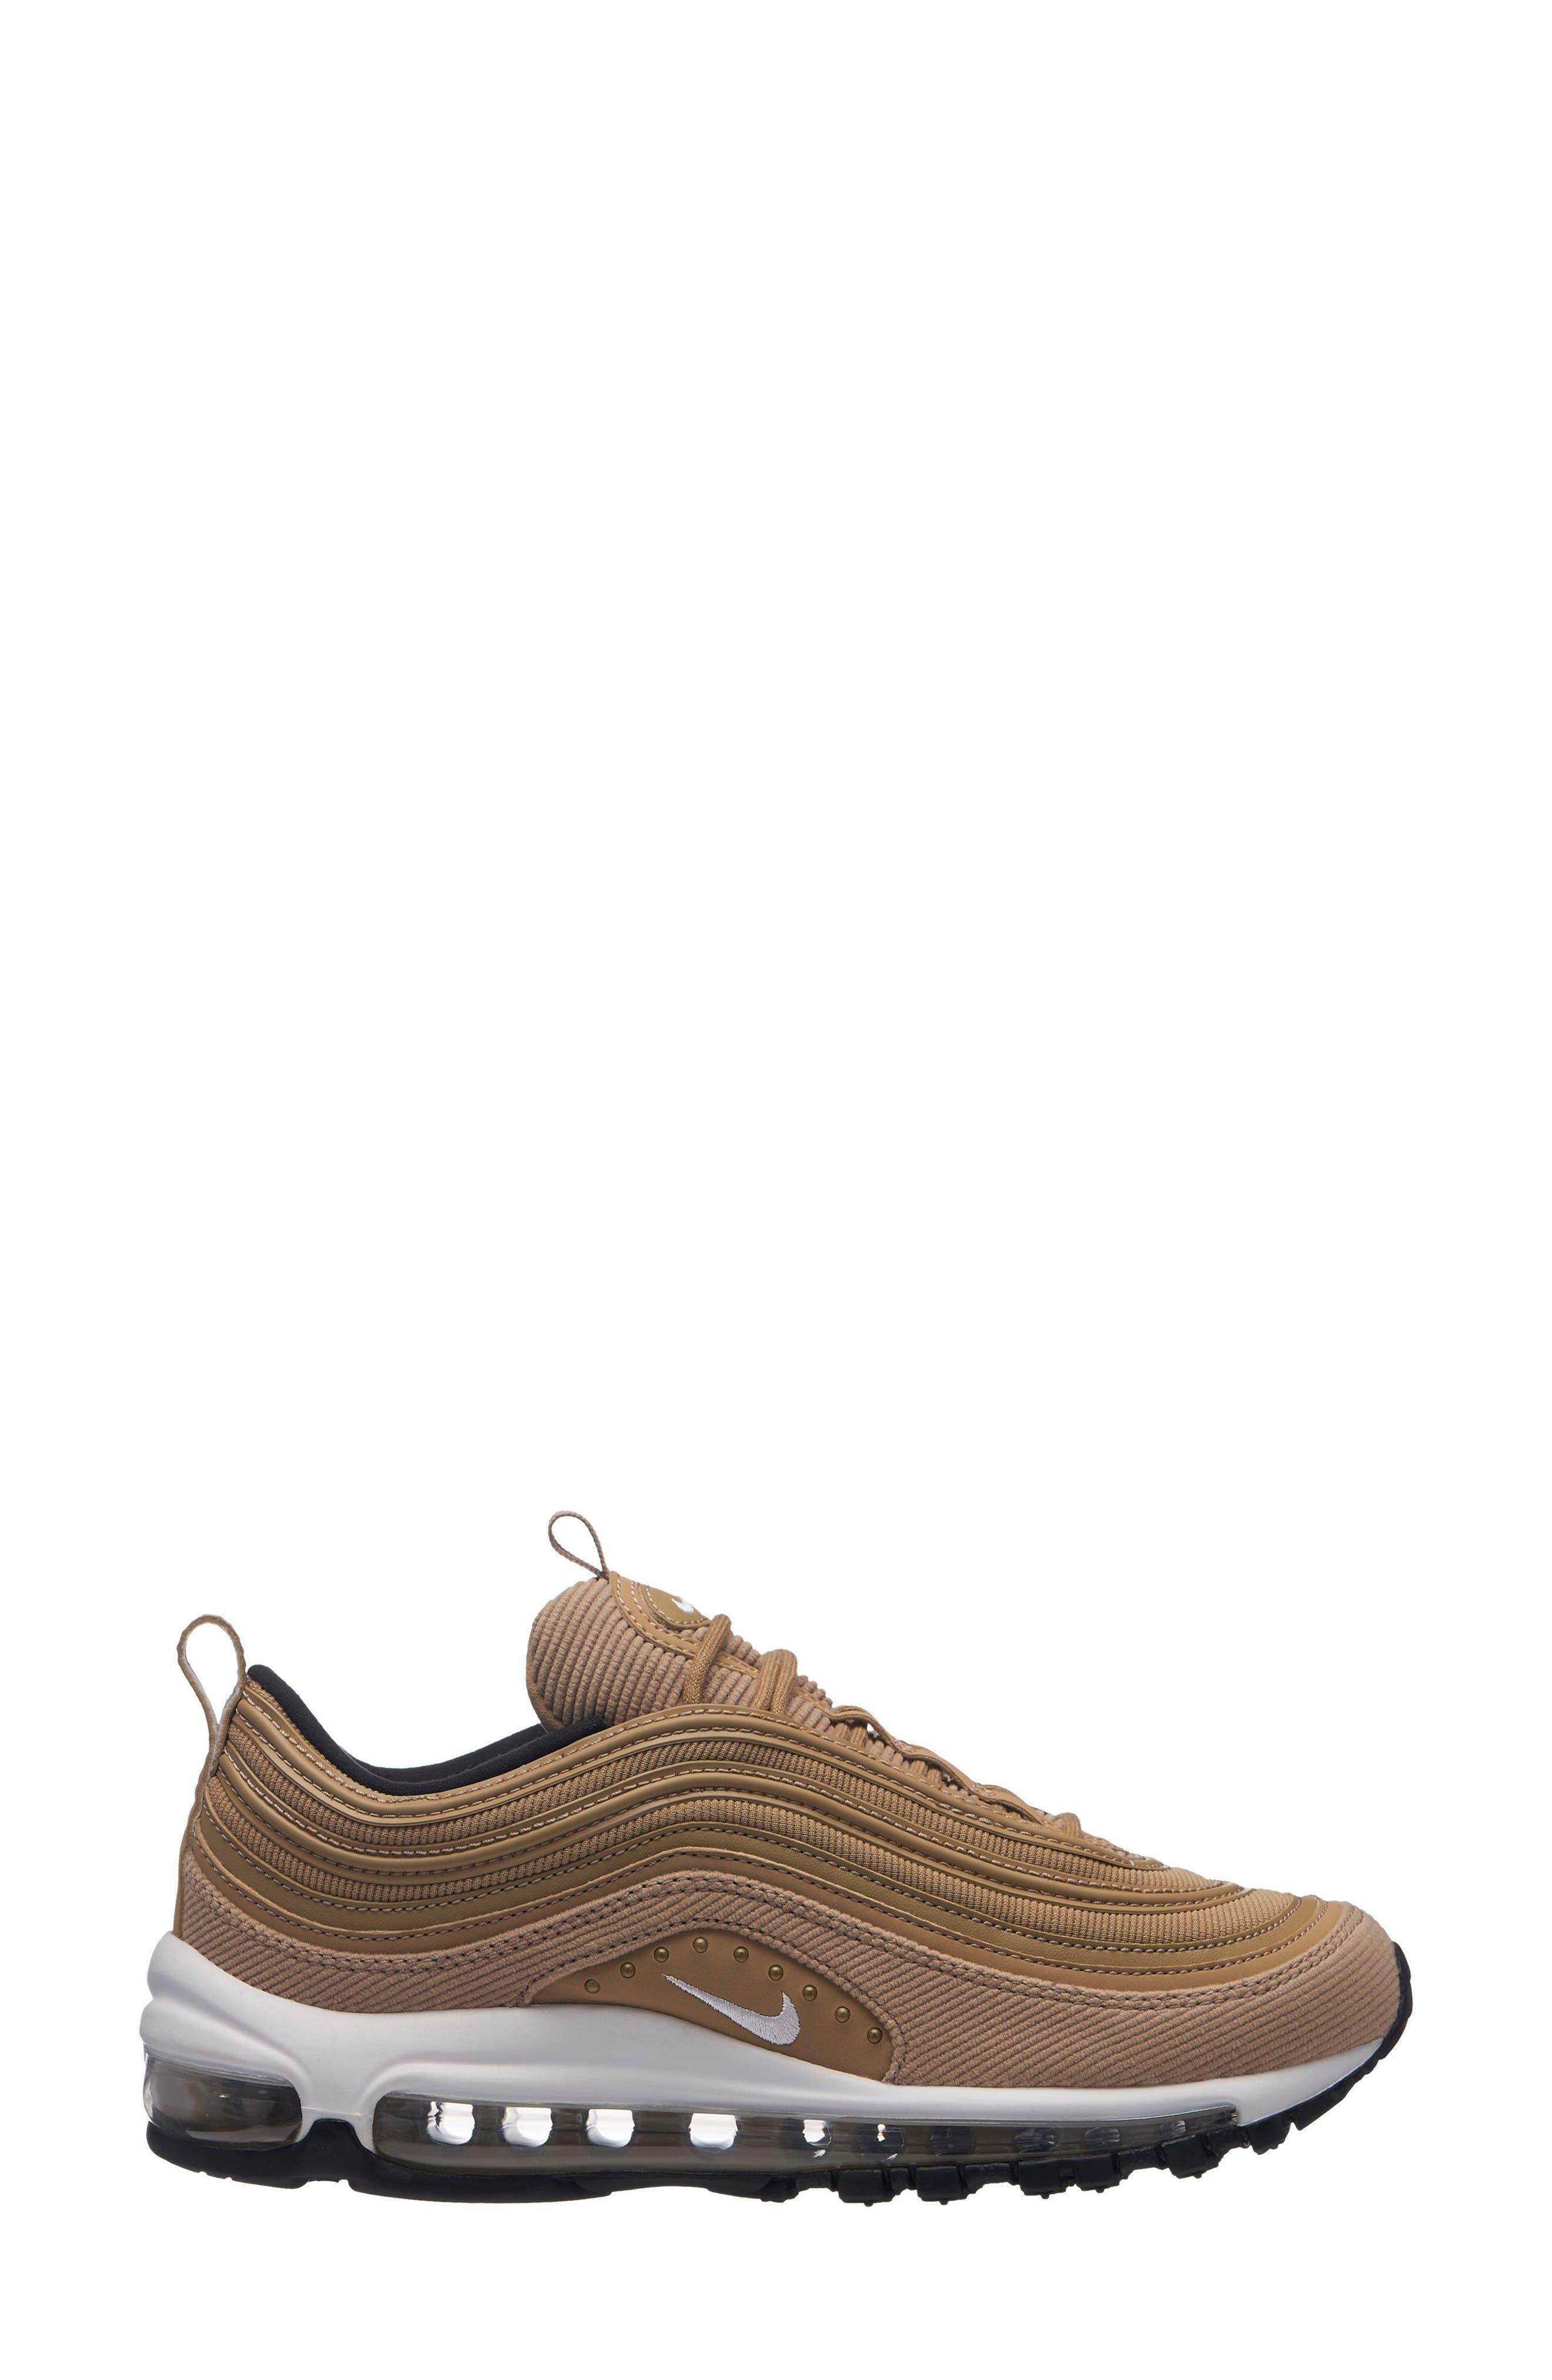 Air Max 97 SE Sneaker,                             Main thumbnail 1, color,                             BEIGE/ WHITE-BLACK